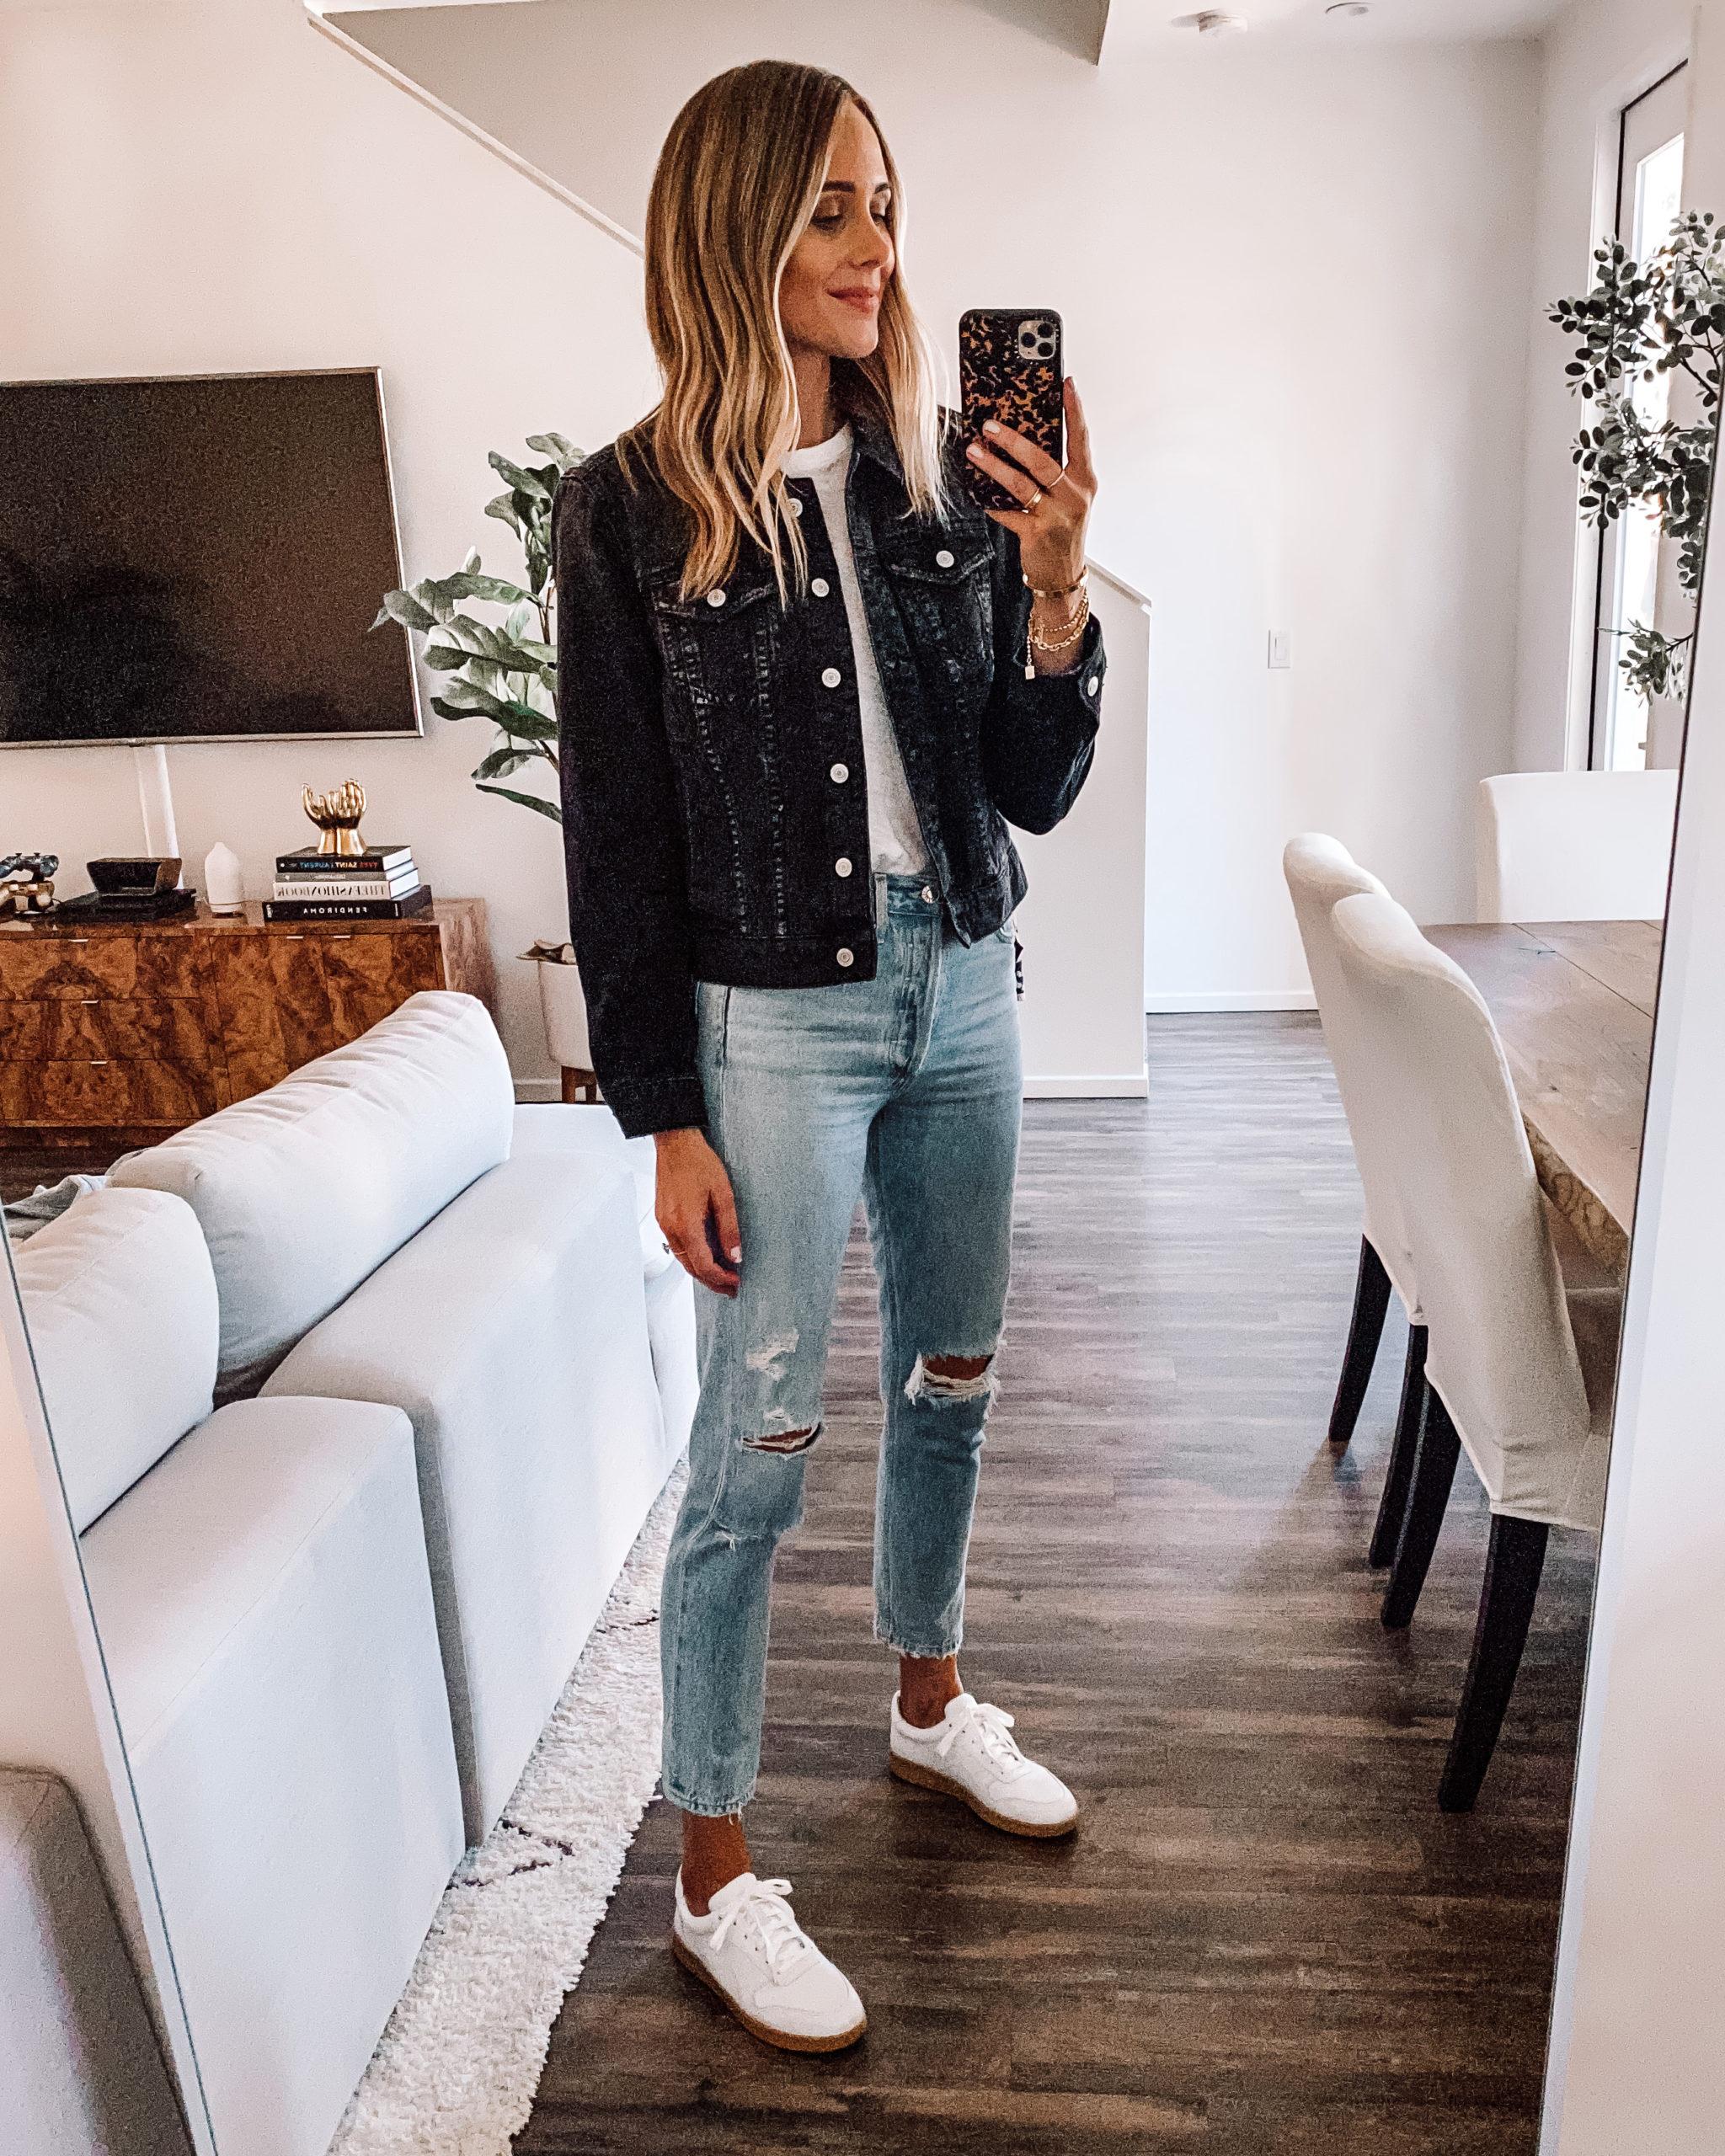 Fashion Jackson Wearing Black Jean Jacket White Tshirt Ripped Skinny Jeans Everlane White Sneakers